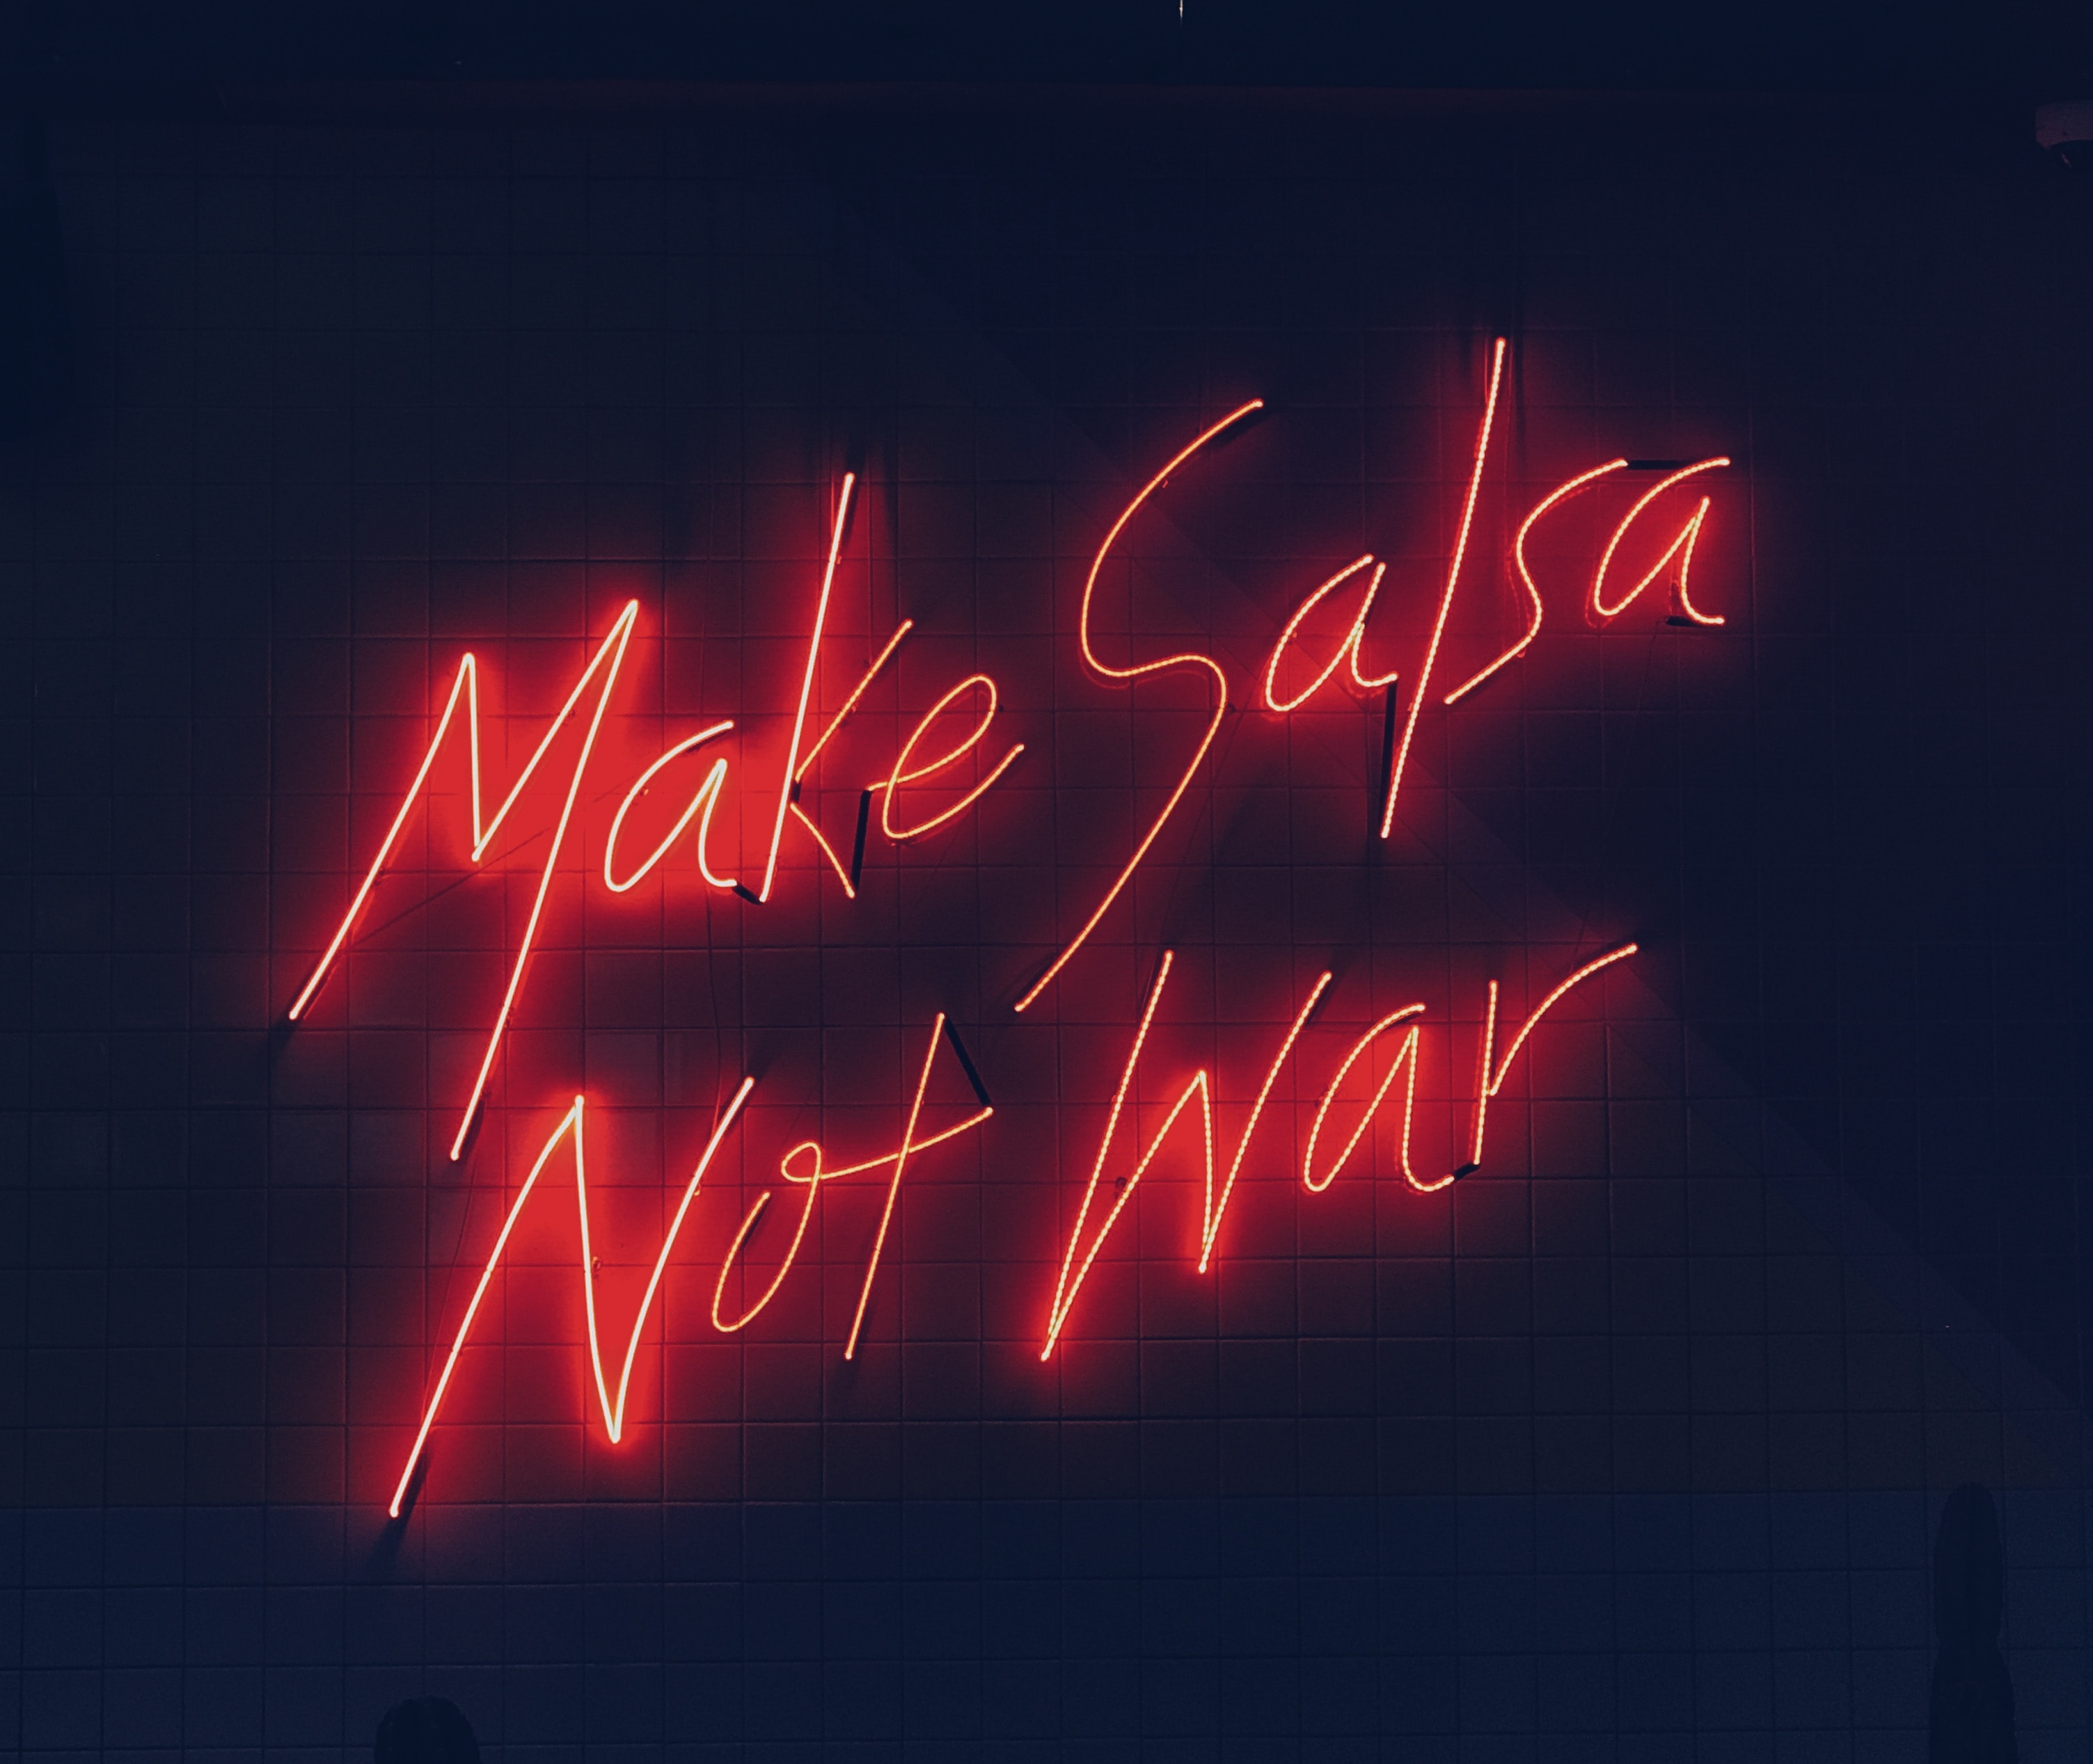 A neon sign that says make salsa not war